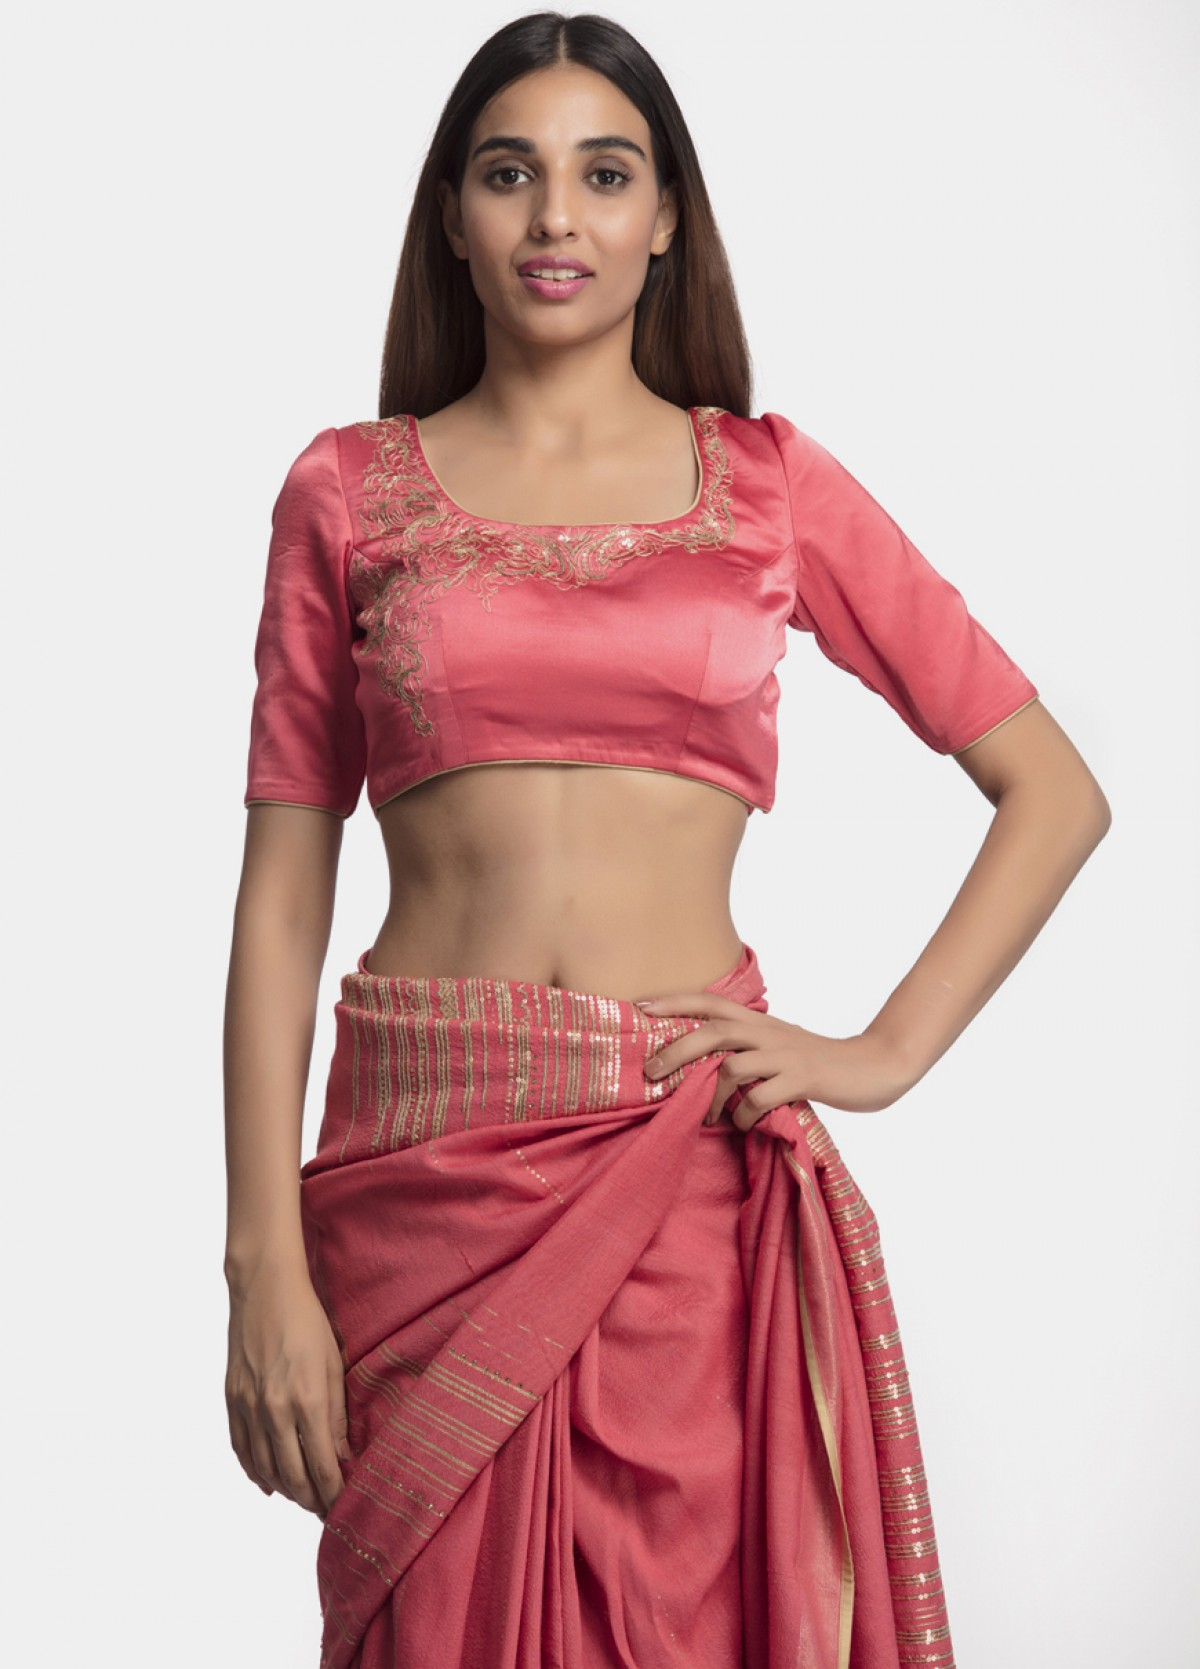 The Pink Tussar Zari Sari